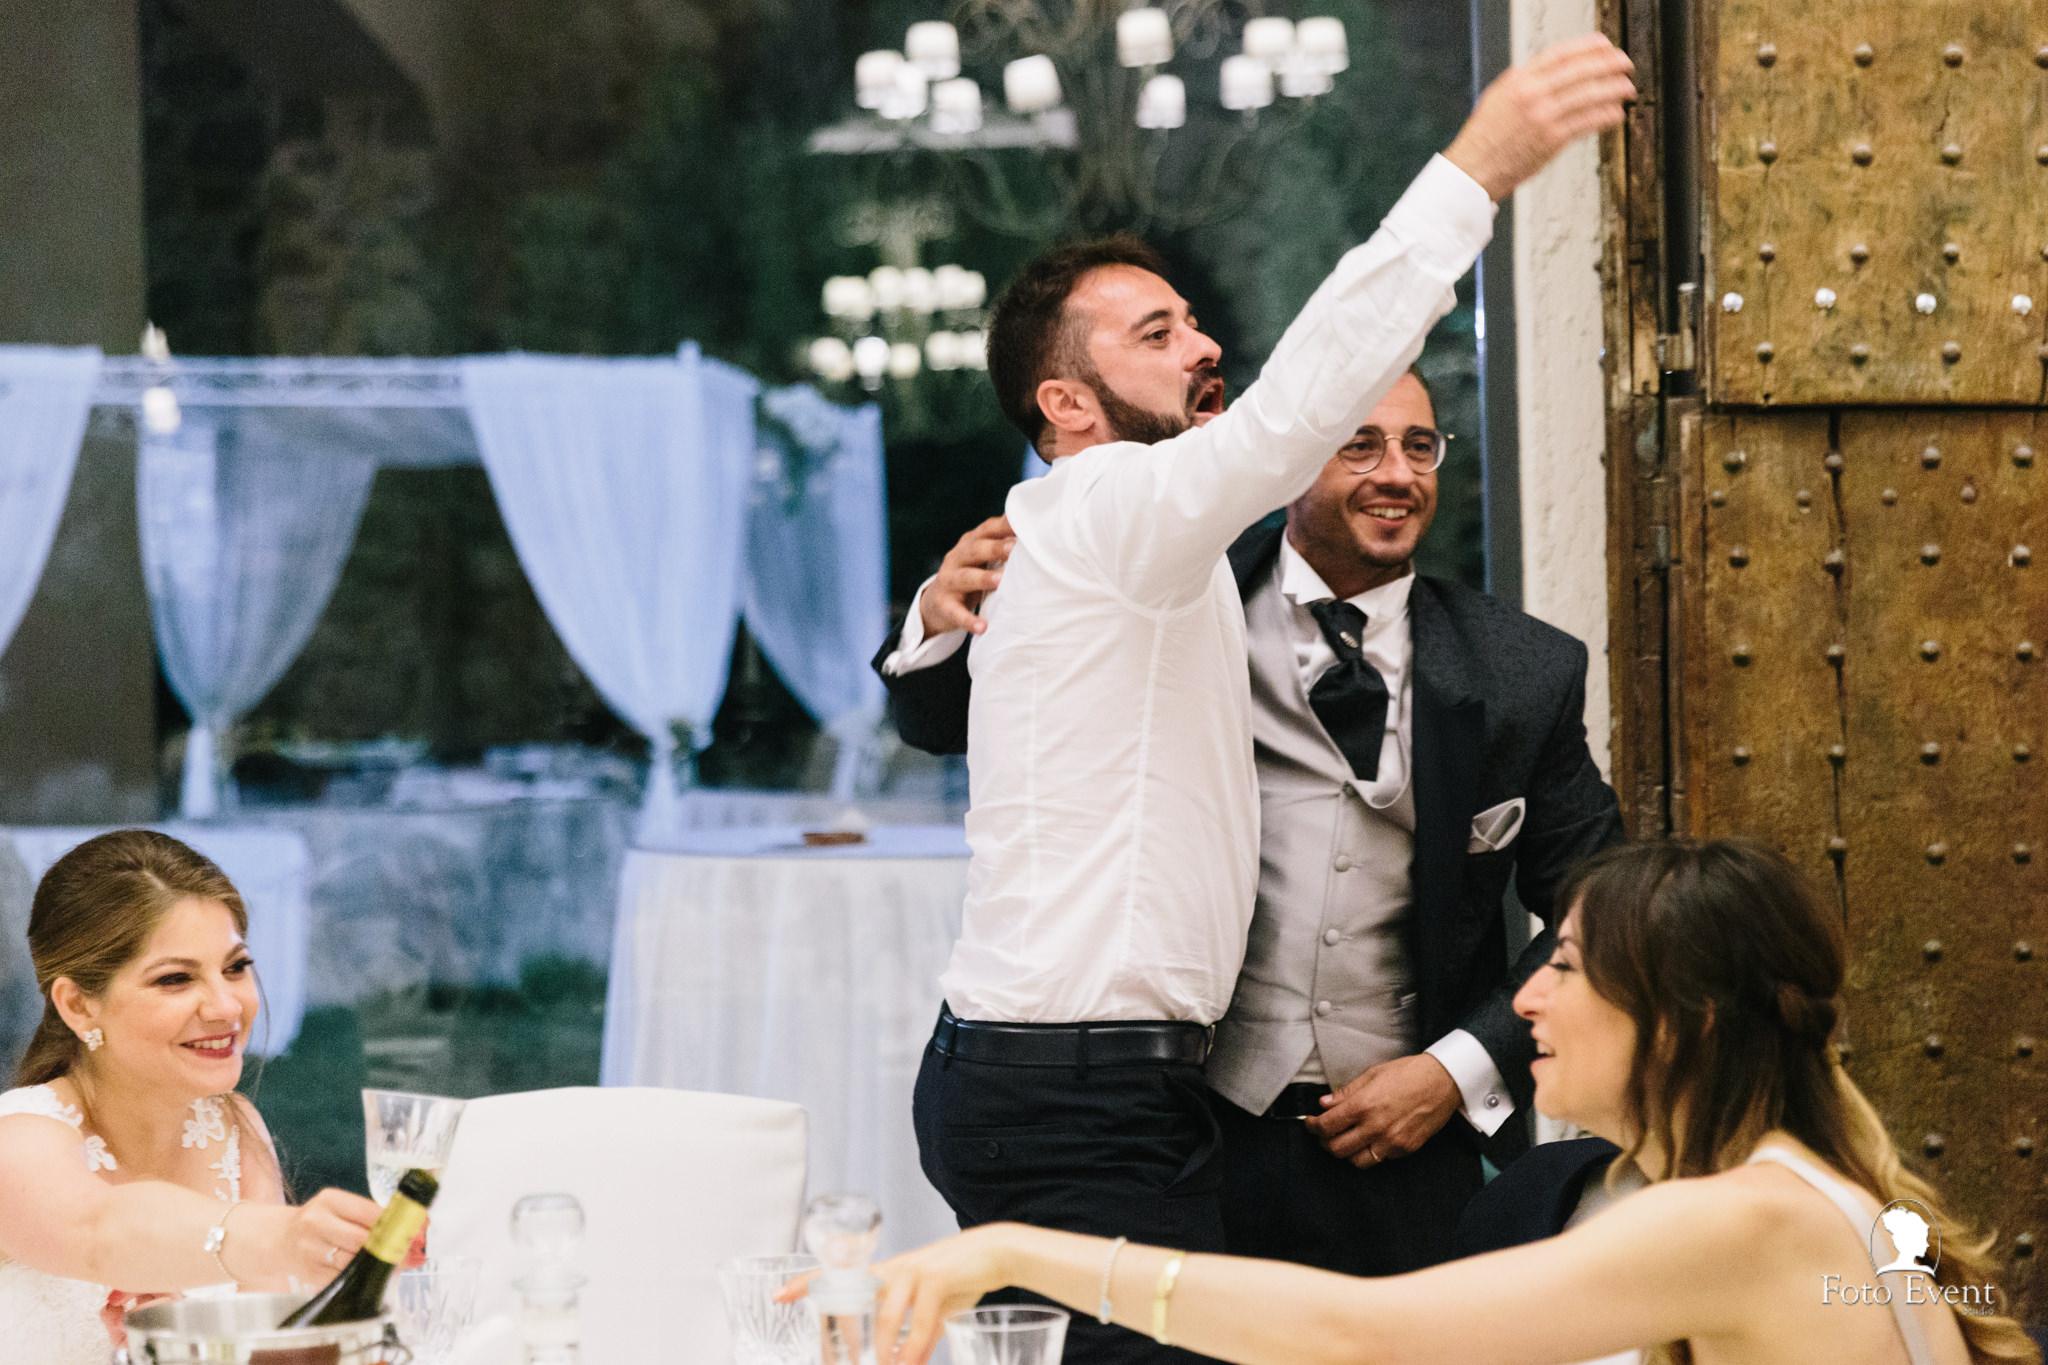 040-2019-06-12-Matrimonio-Rosa-e-Angelo-Ripellino-5DE-1426